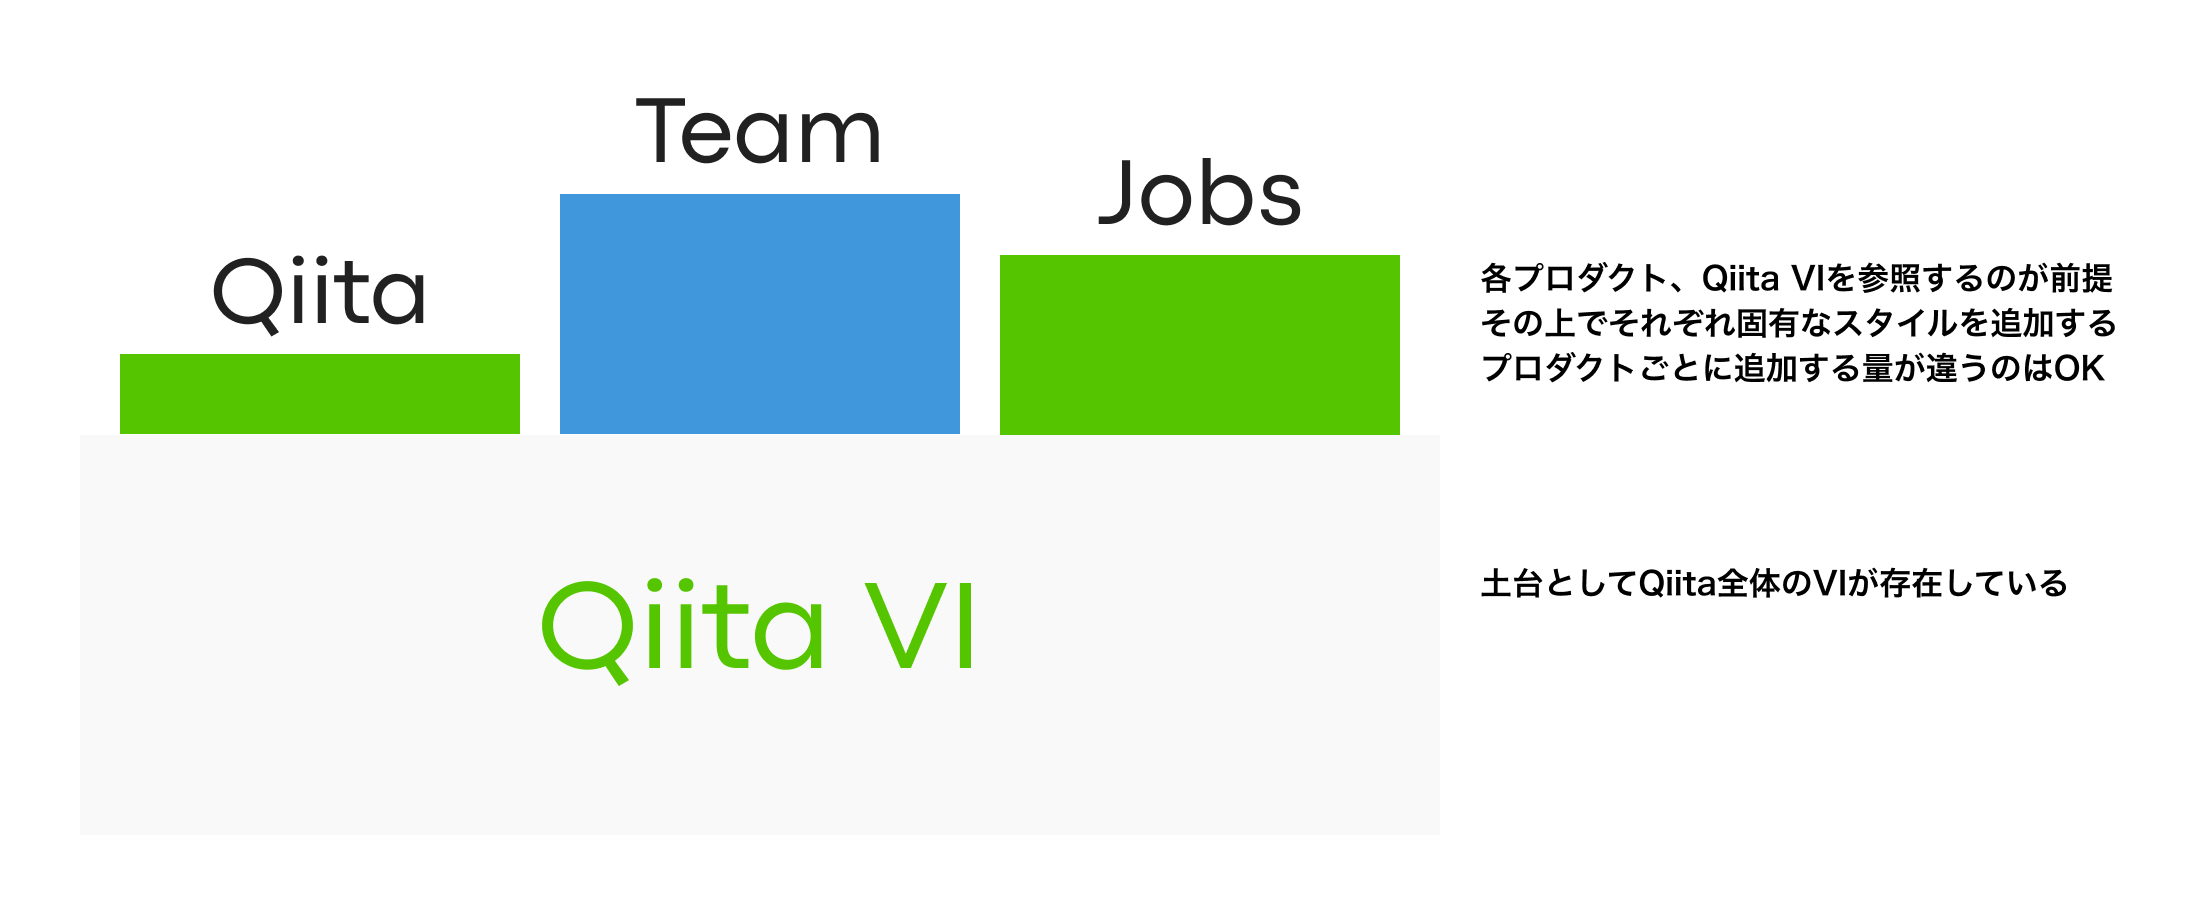 Qiita VIと各プロダクトごとのオーバーライドの関係性